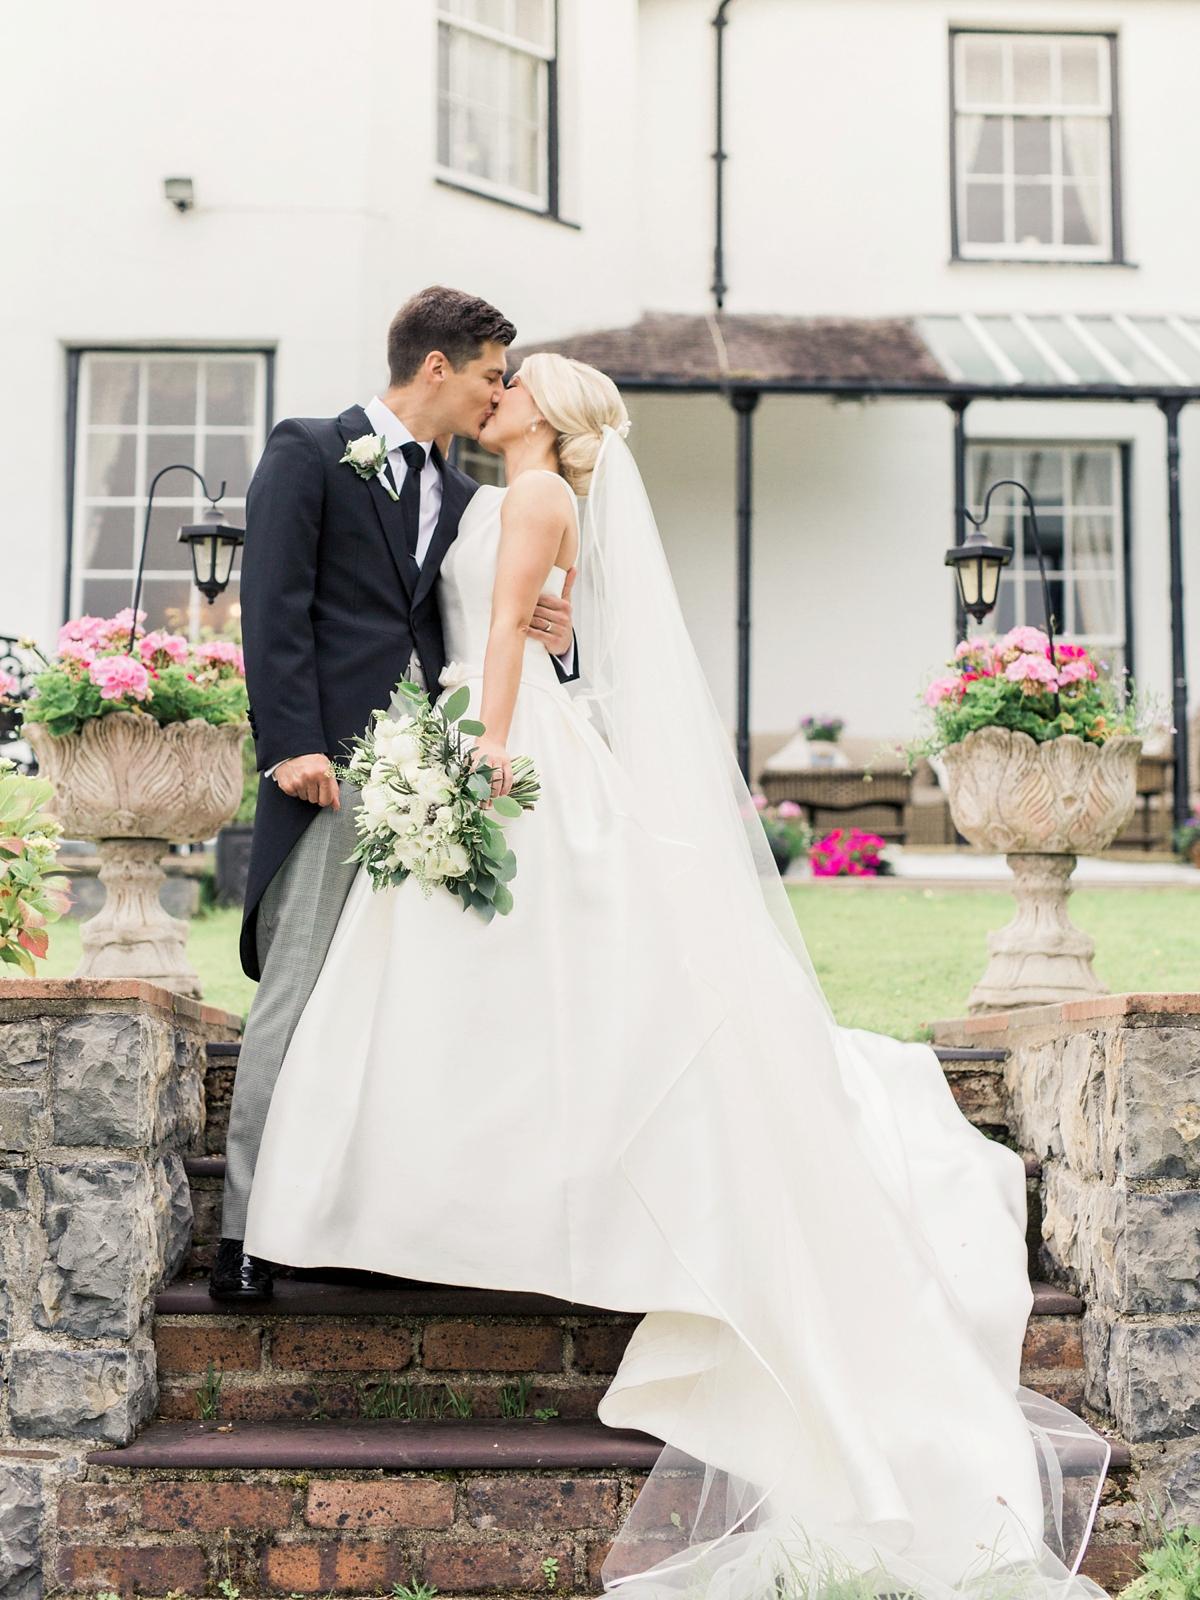 pronovias audrey bride classic elegant english wedding  - Audrey Hepburn Inspired Elegance for a Classy and Modern Wedding in Neutral Shades